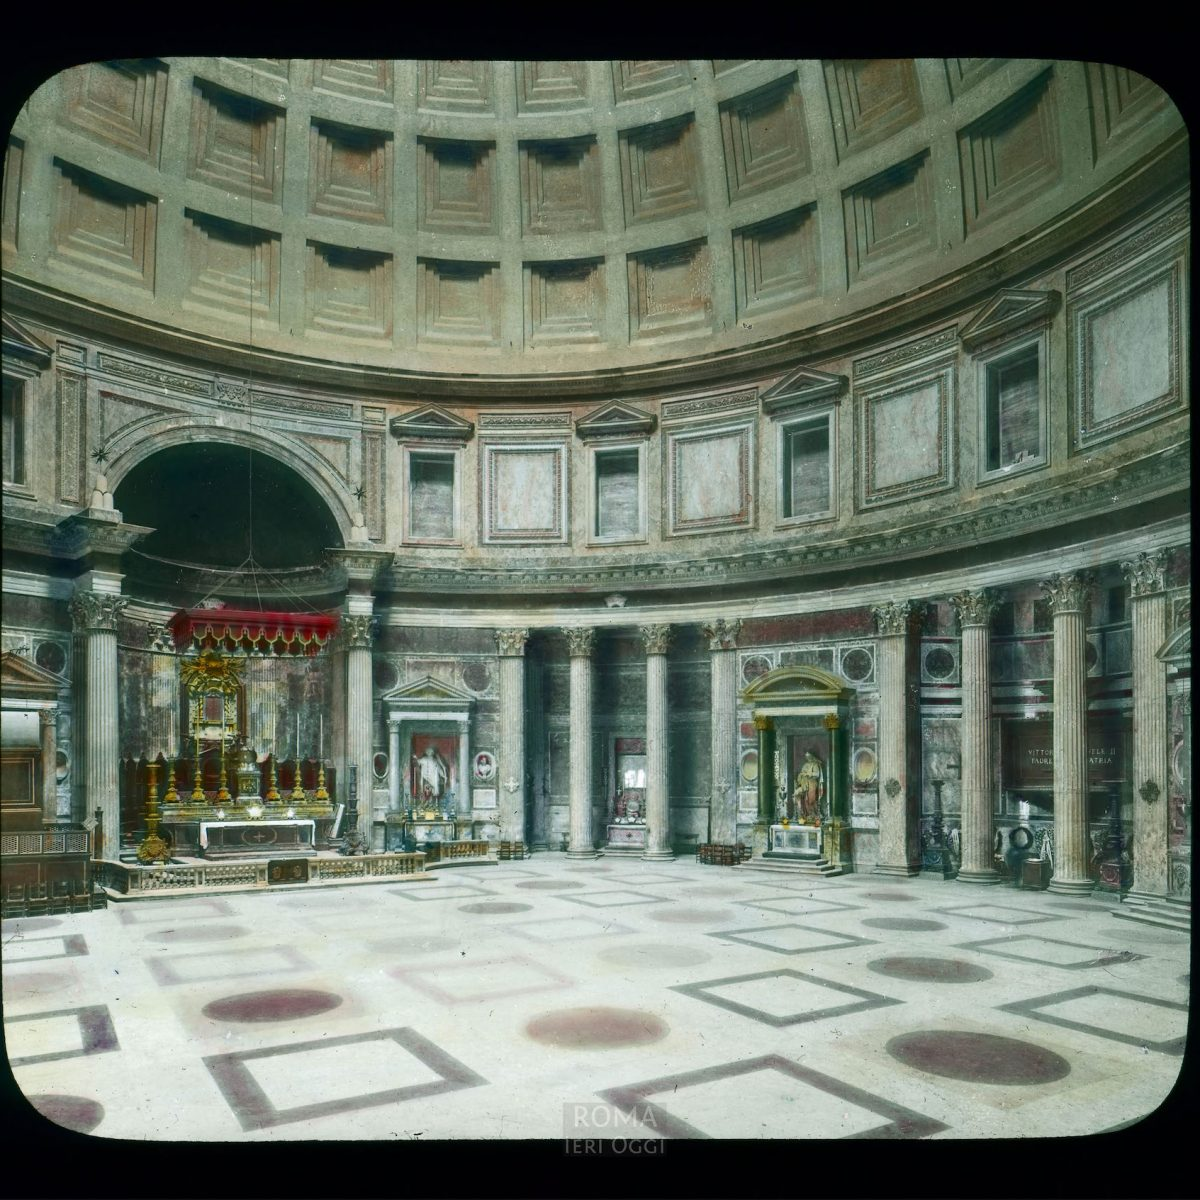 Rome. Pantheon (Santa Maria dei Martiri): interior view View in tinted lantern slide, ca. 1919-1938. The Pantheon dates from 118-128 C.E.